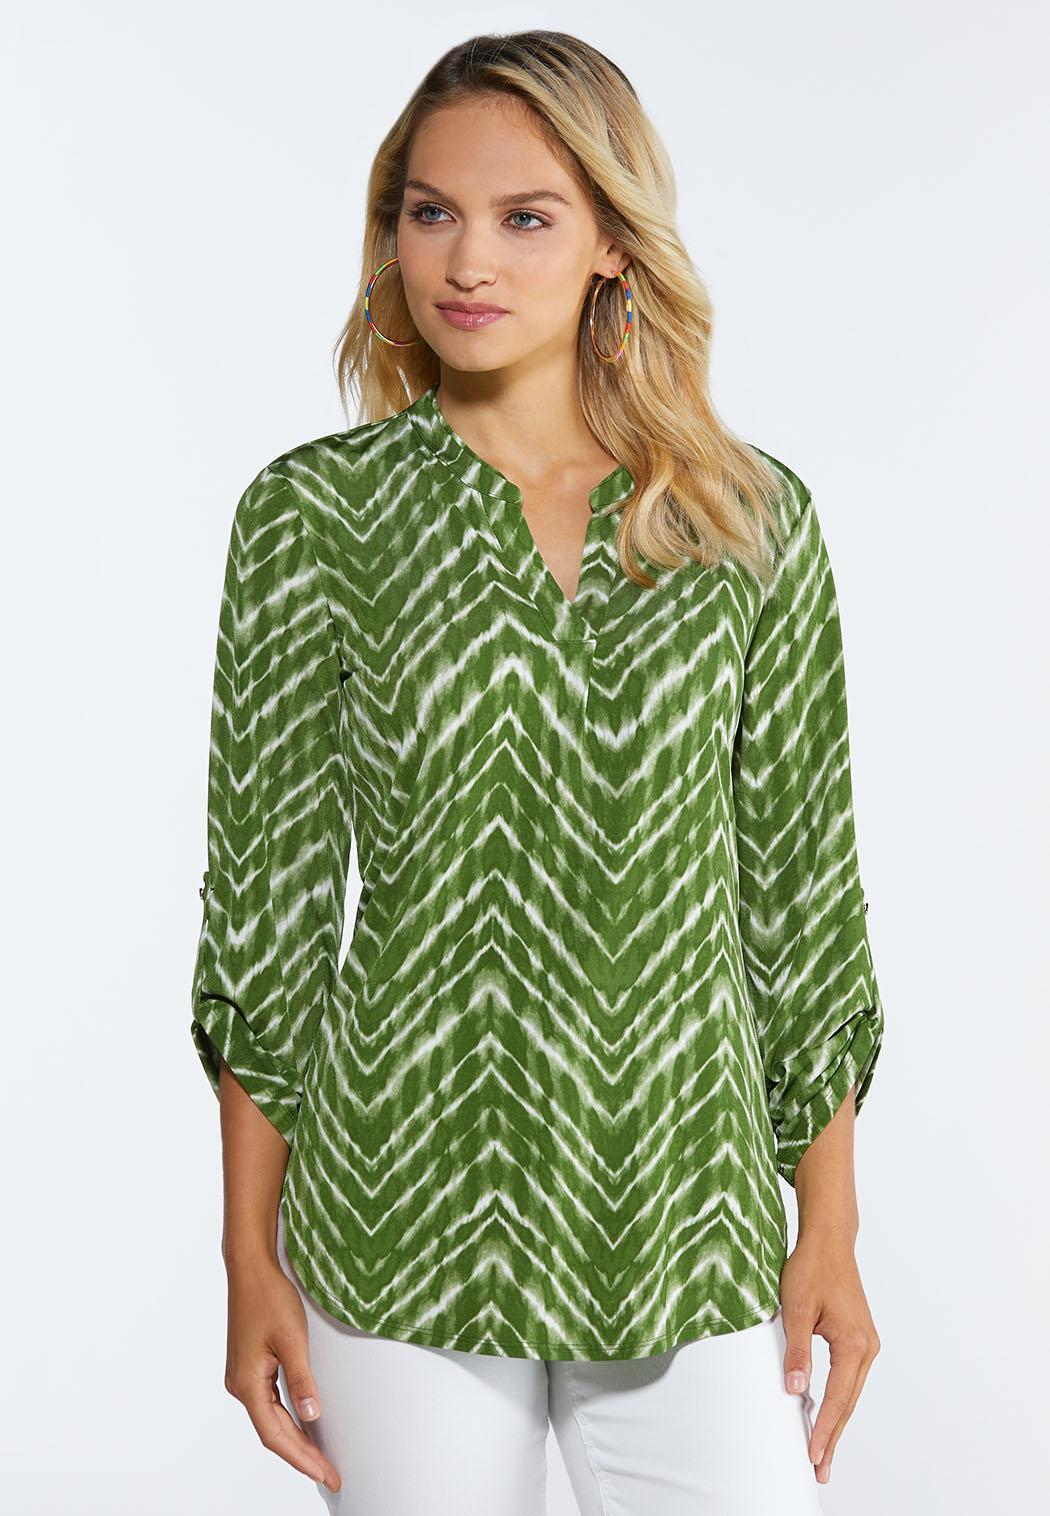 Green Tie Dye Top